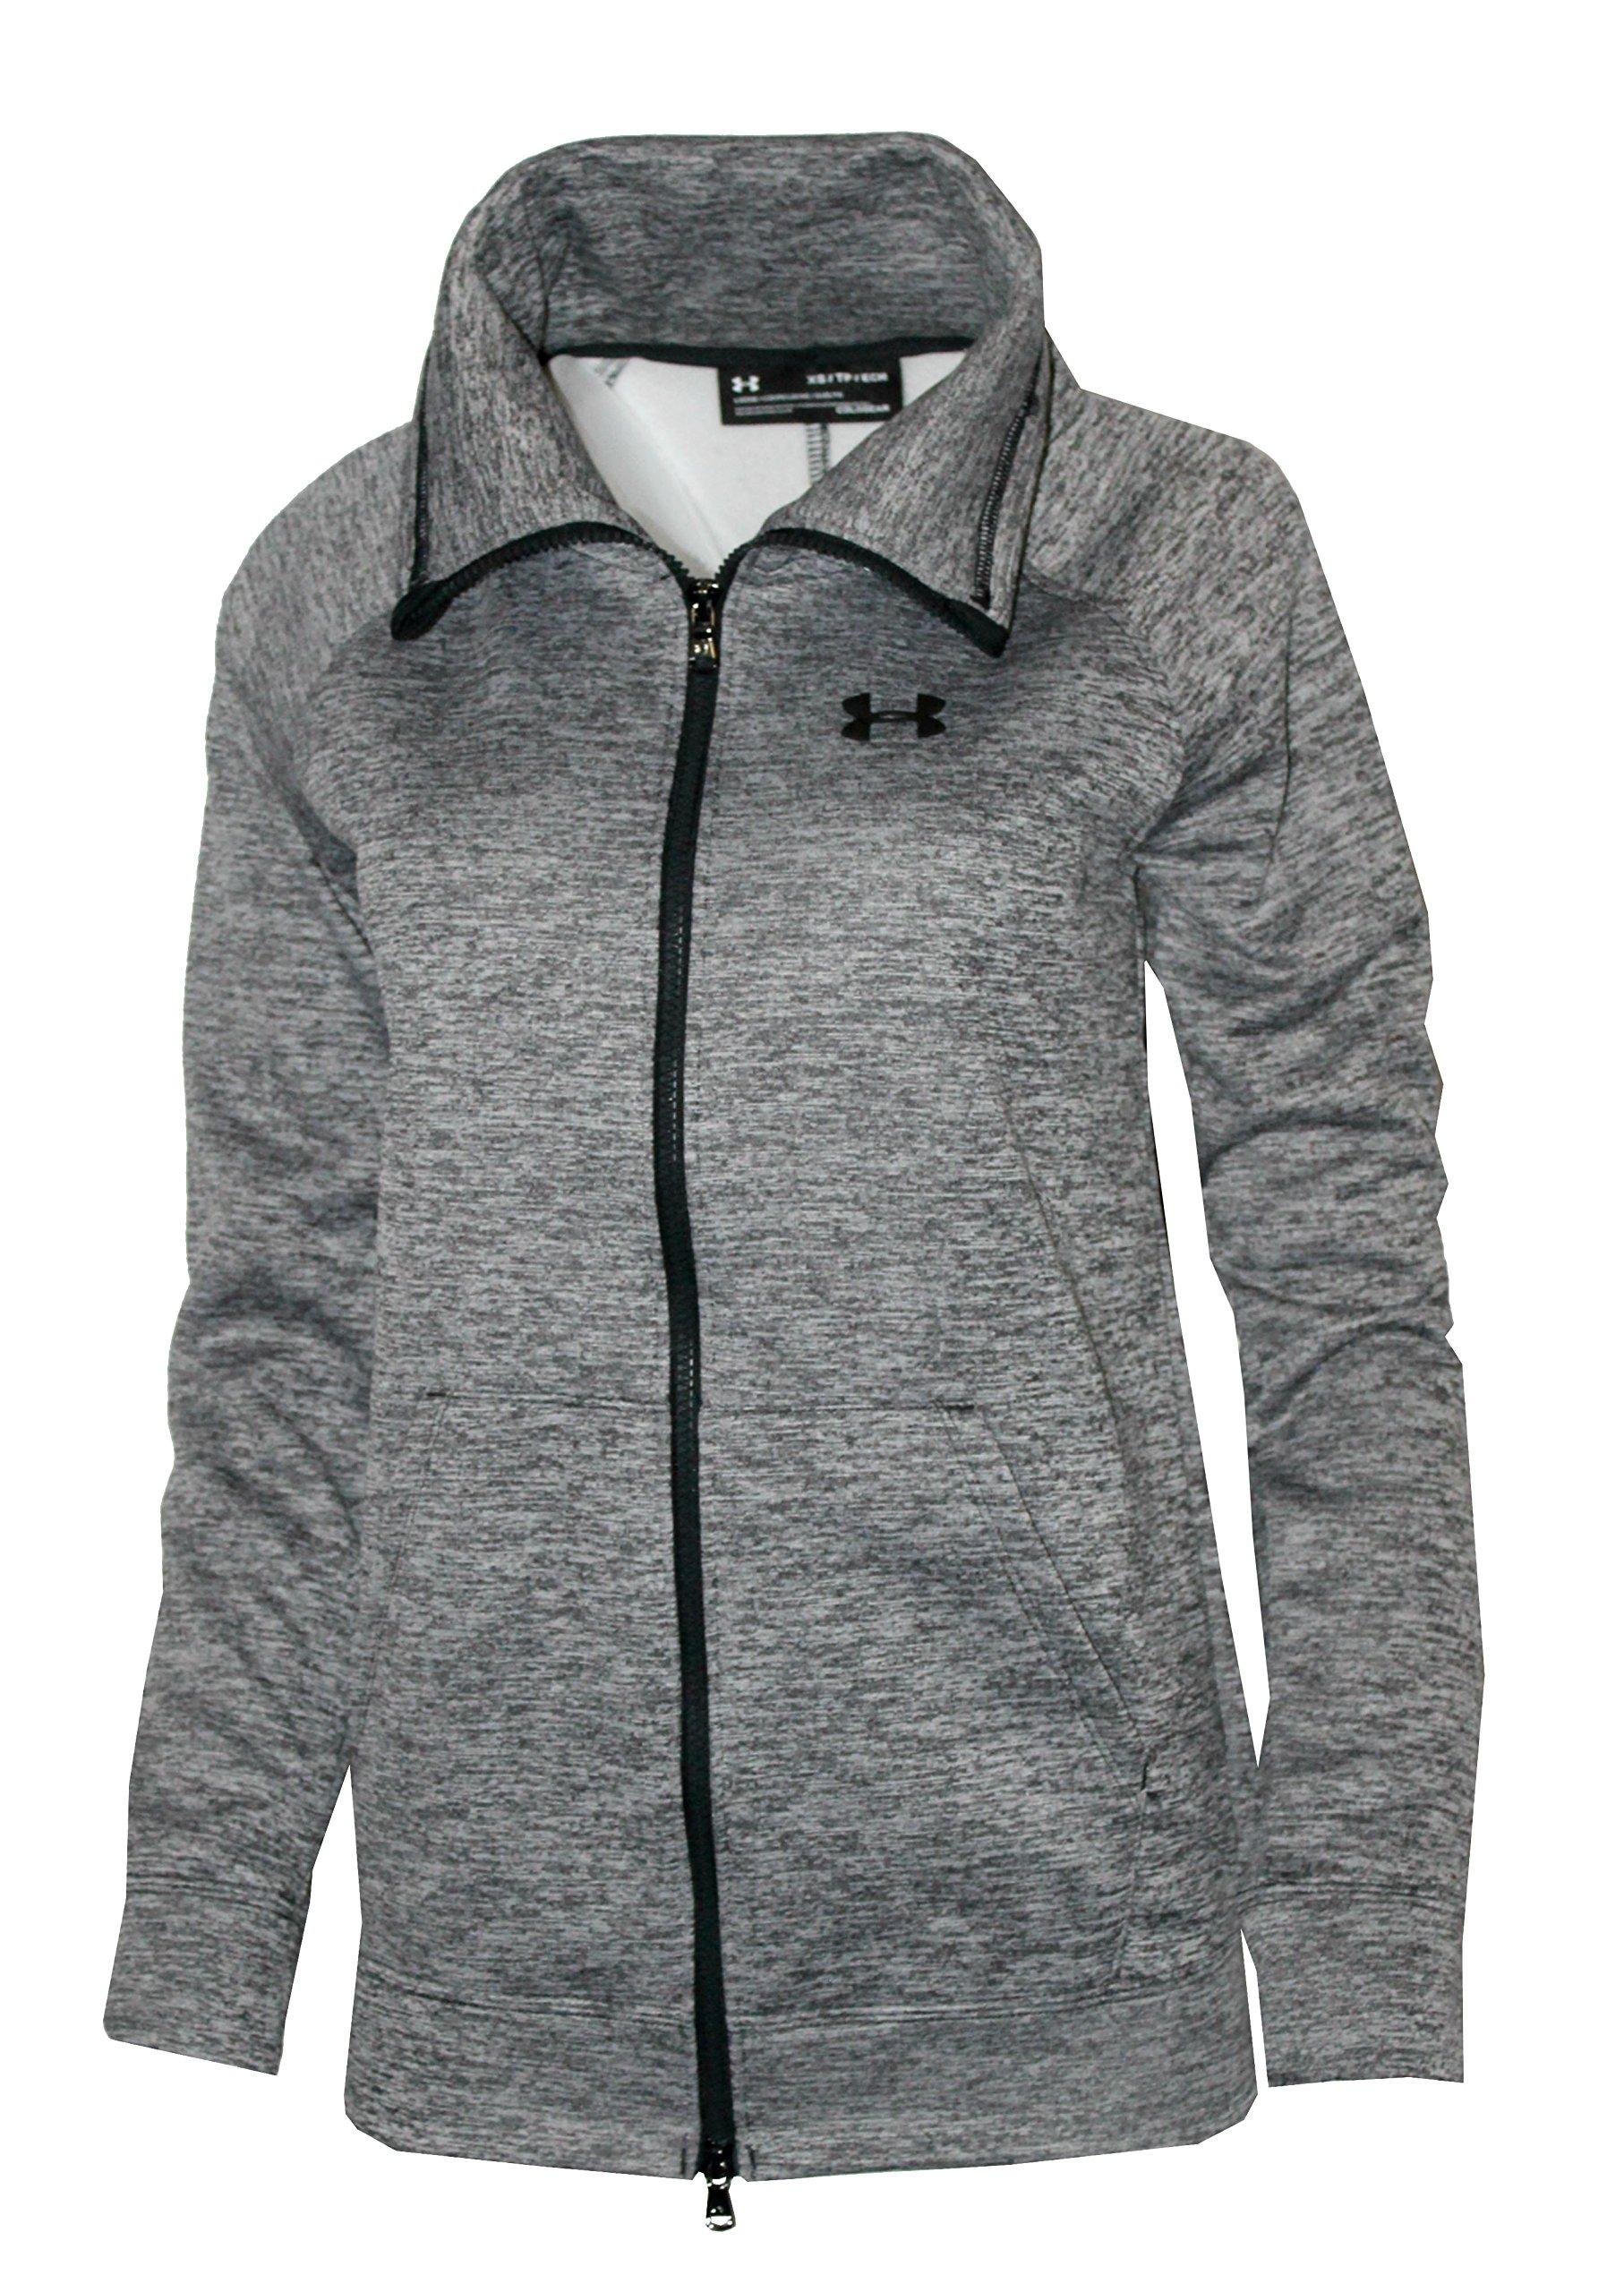 Under Armour Women's UA Storm Full Zip Athletic Shirt (Grey Heather, S)